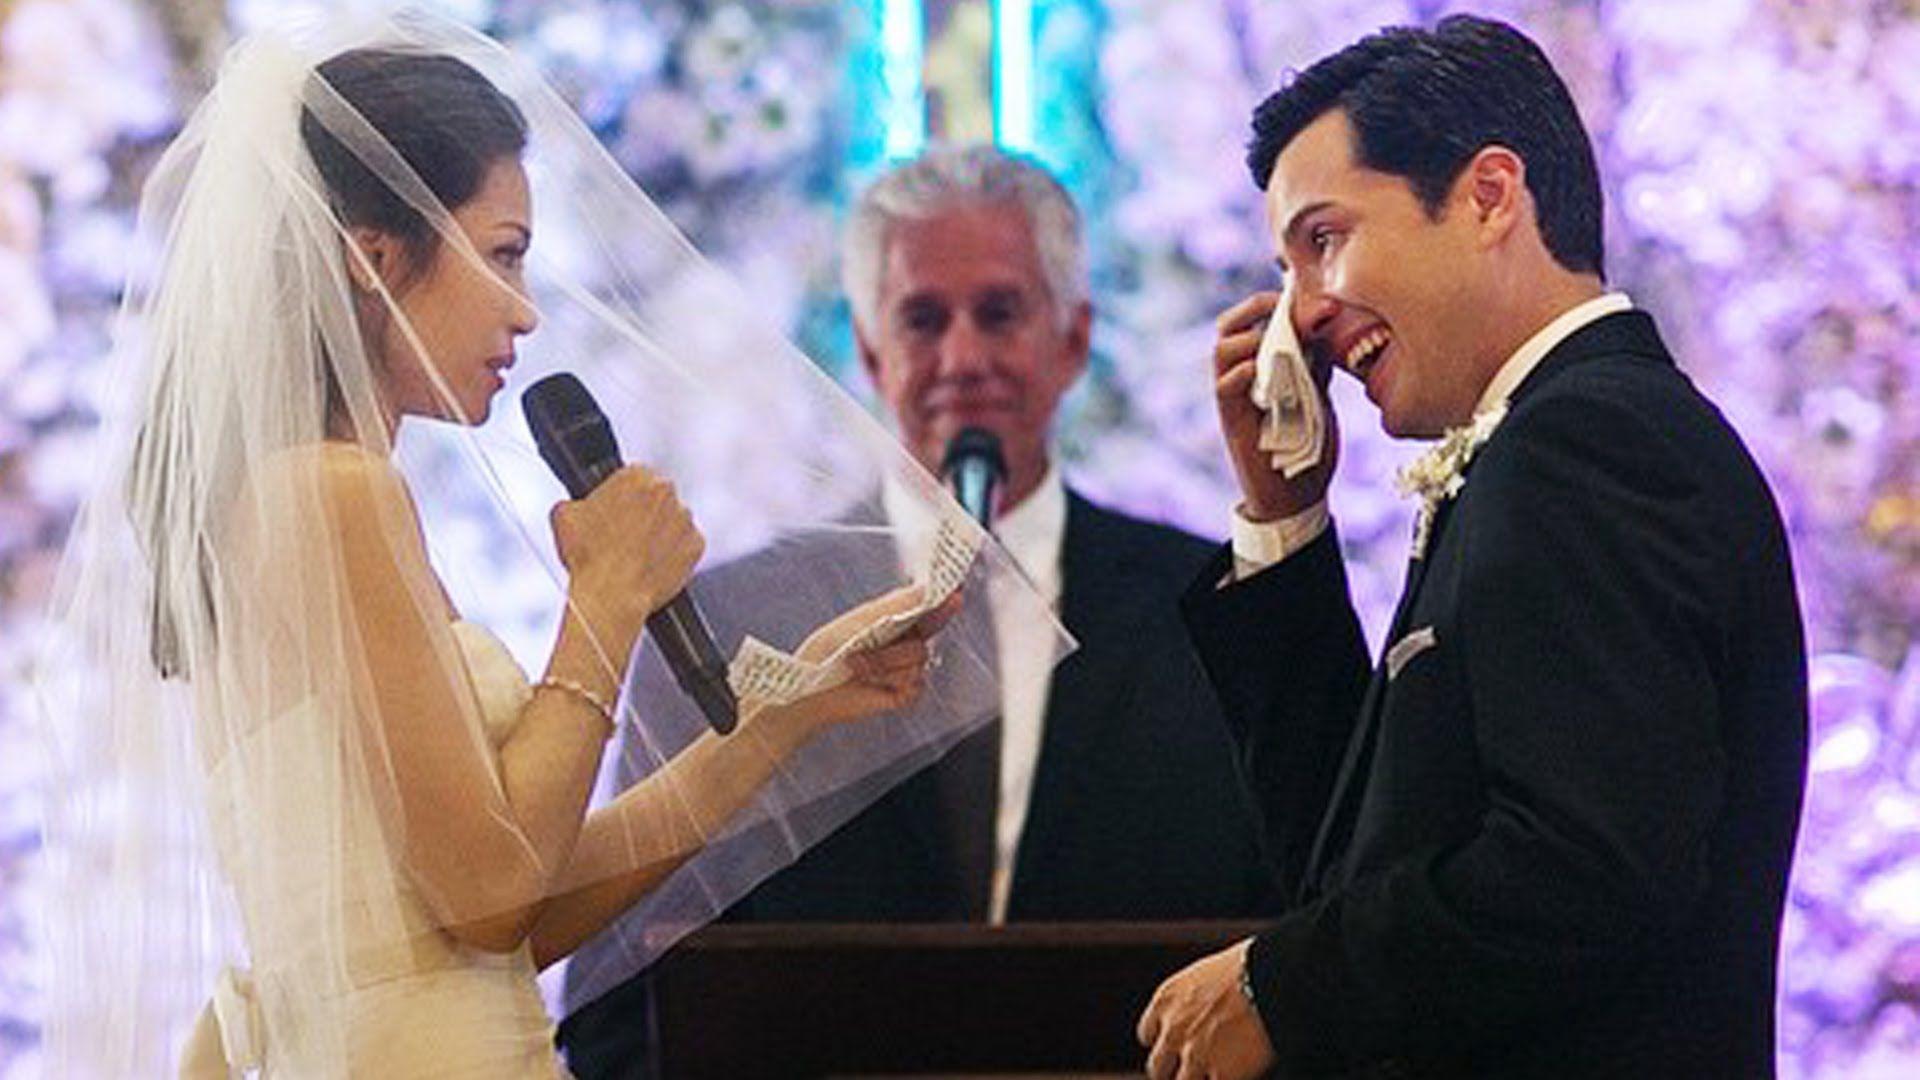 Toni Gonzaga Paul Soriano Wedding Special Full Wedding Video Marriage Vows Wedding Video Wedding Vows